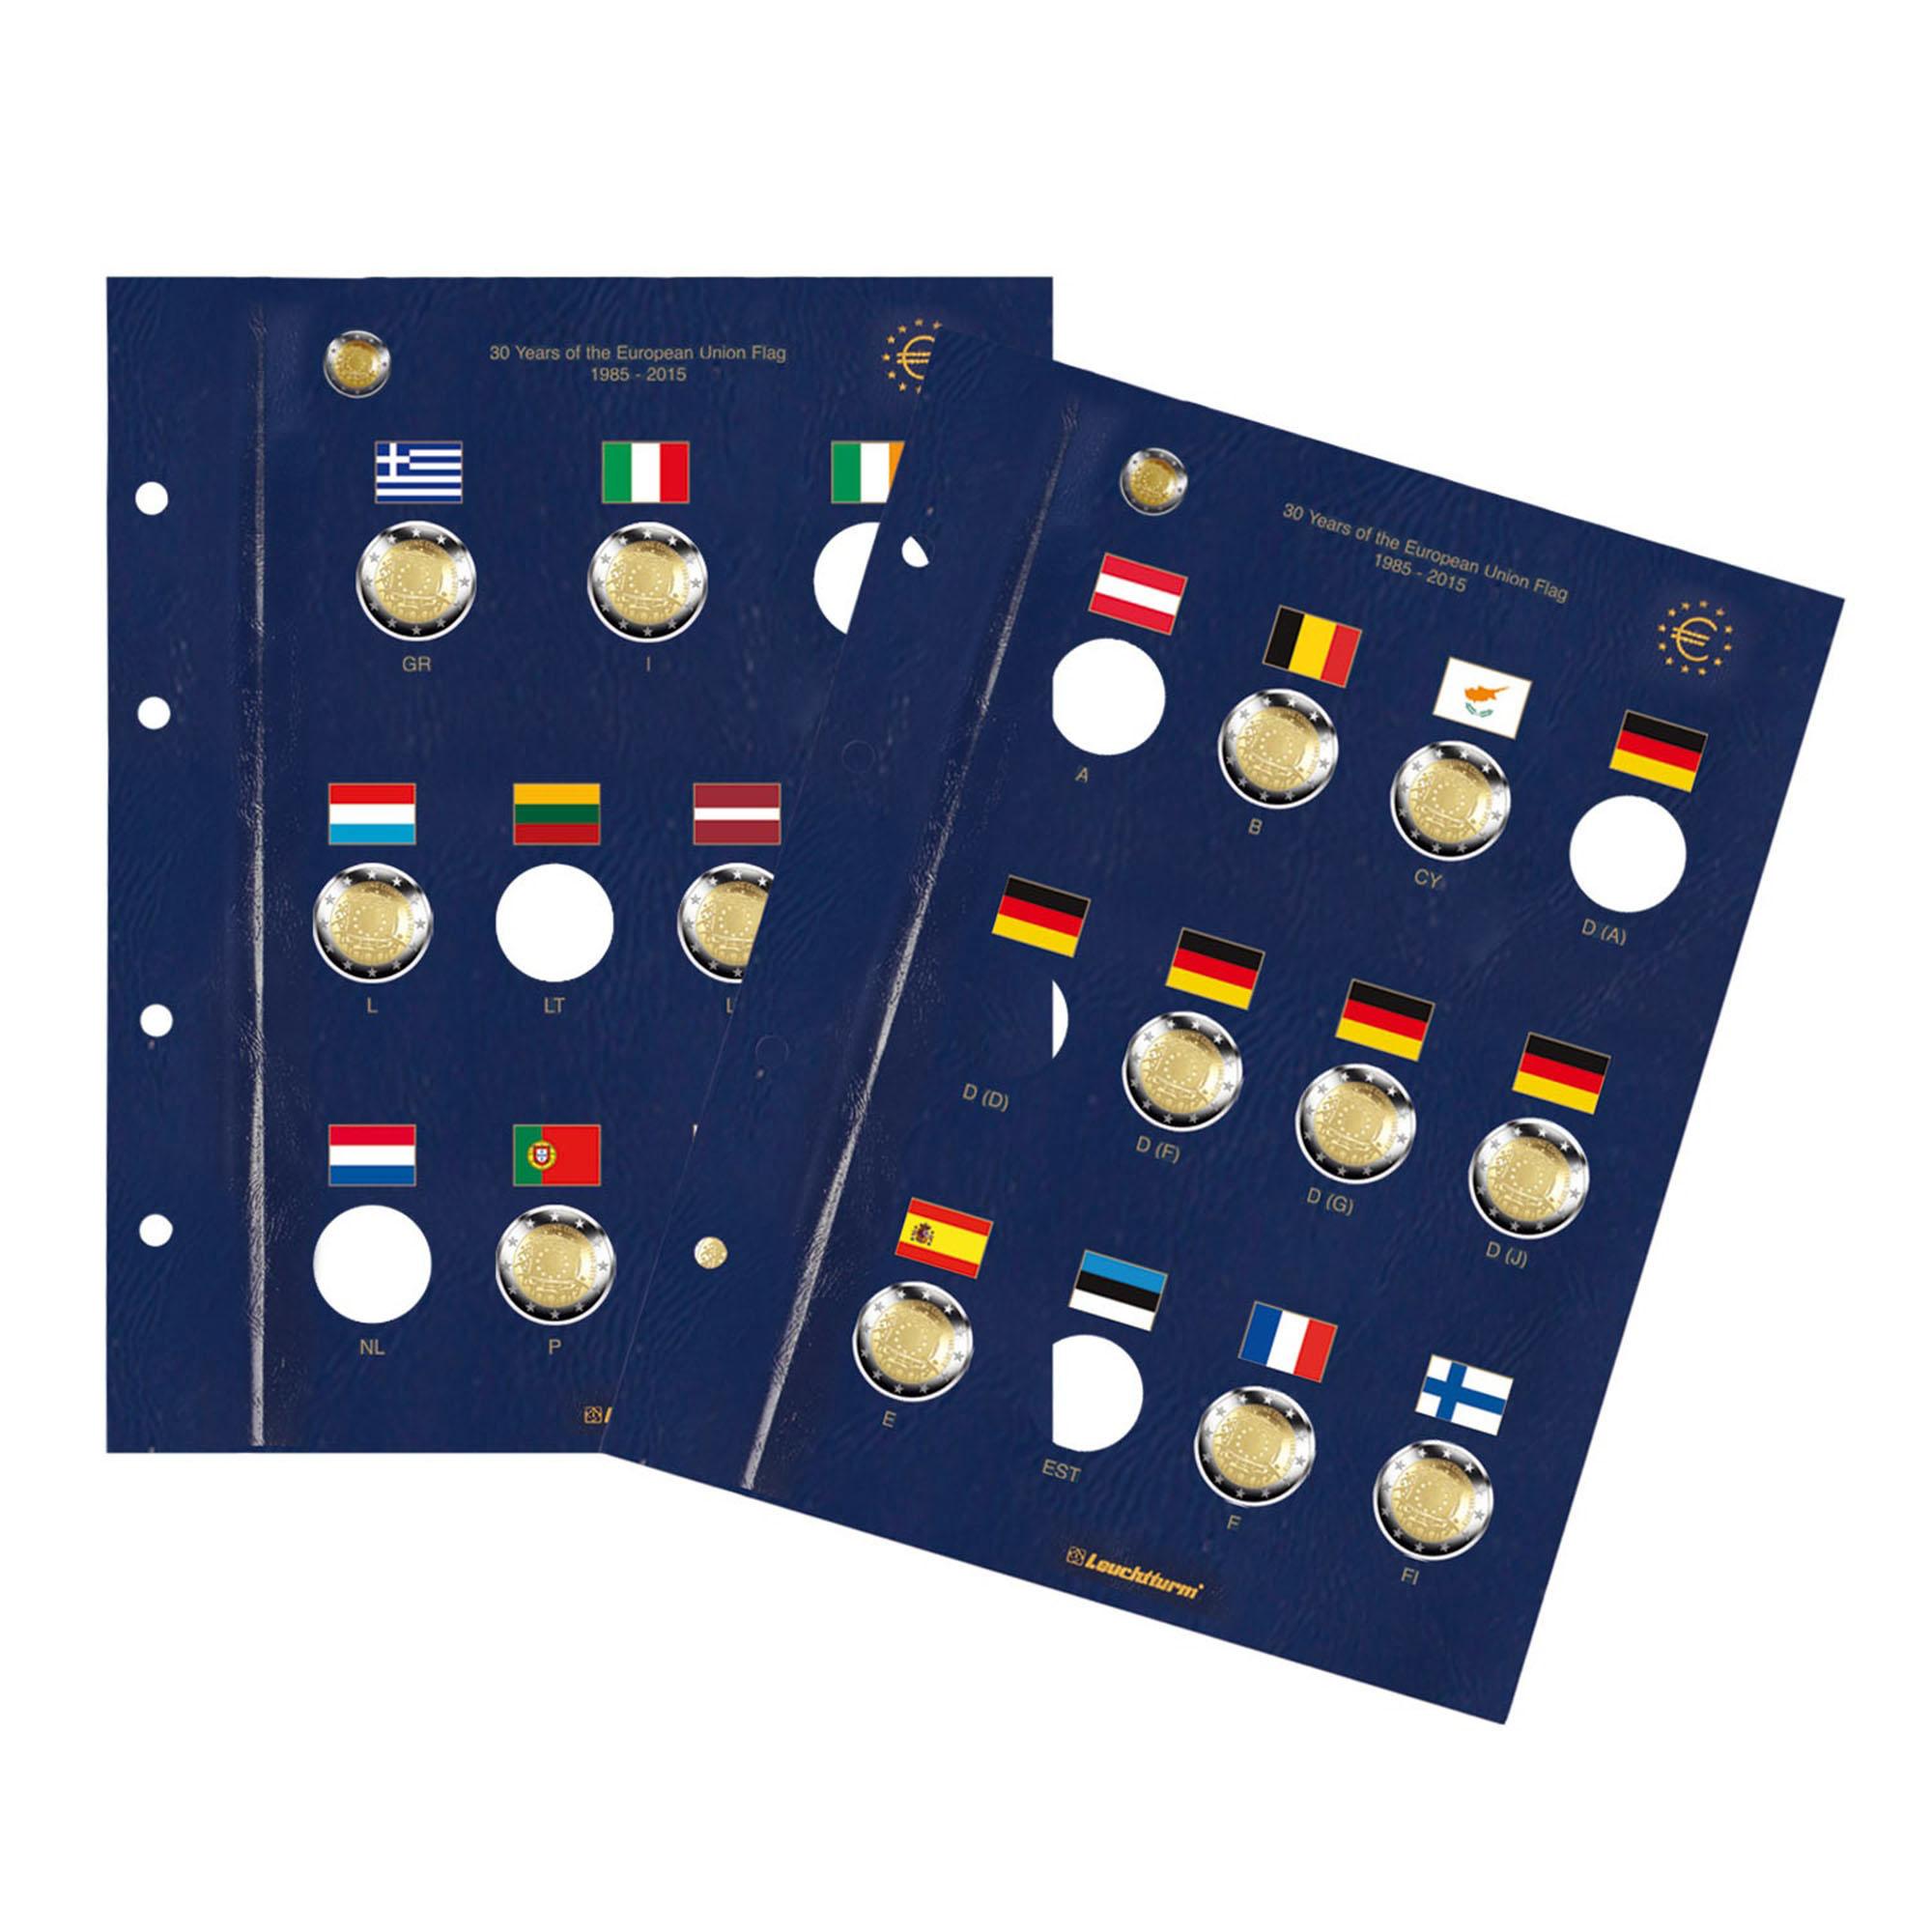 Лист VISTA 30 лет флагу ЕС (2 шт.)